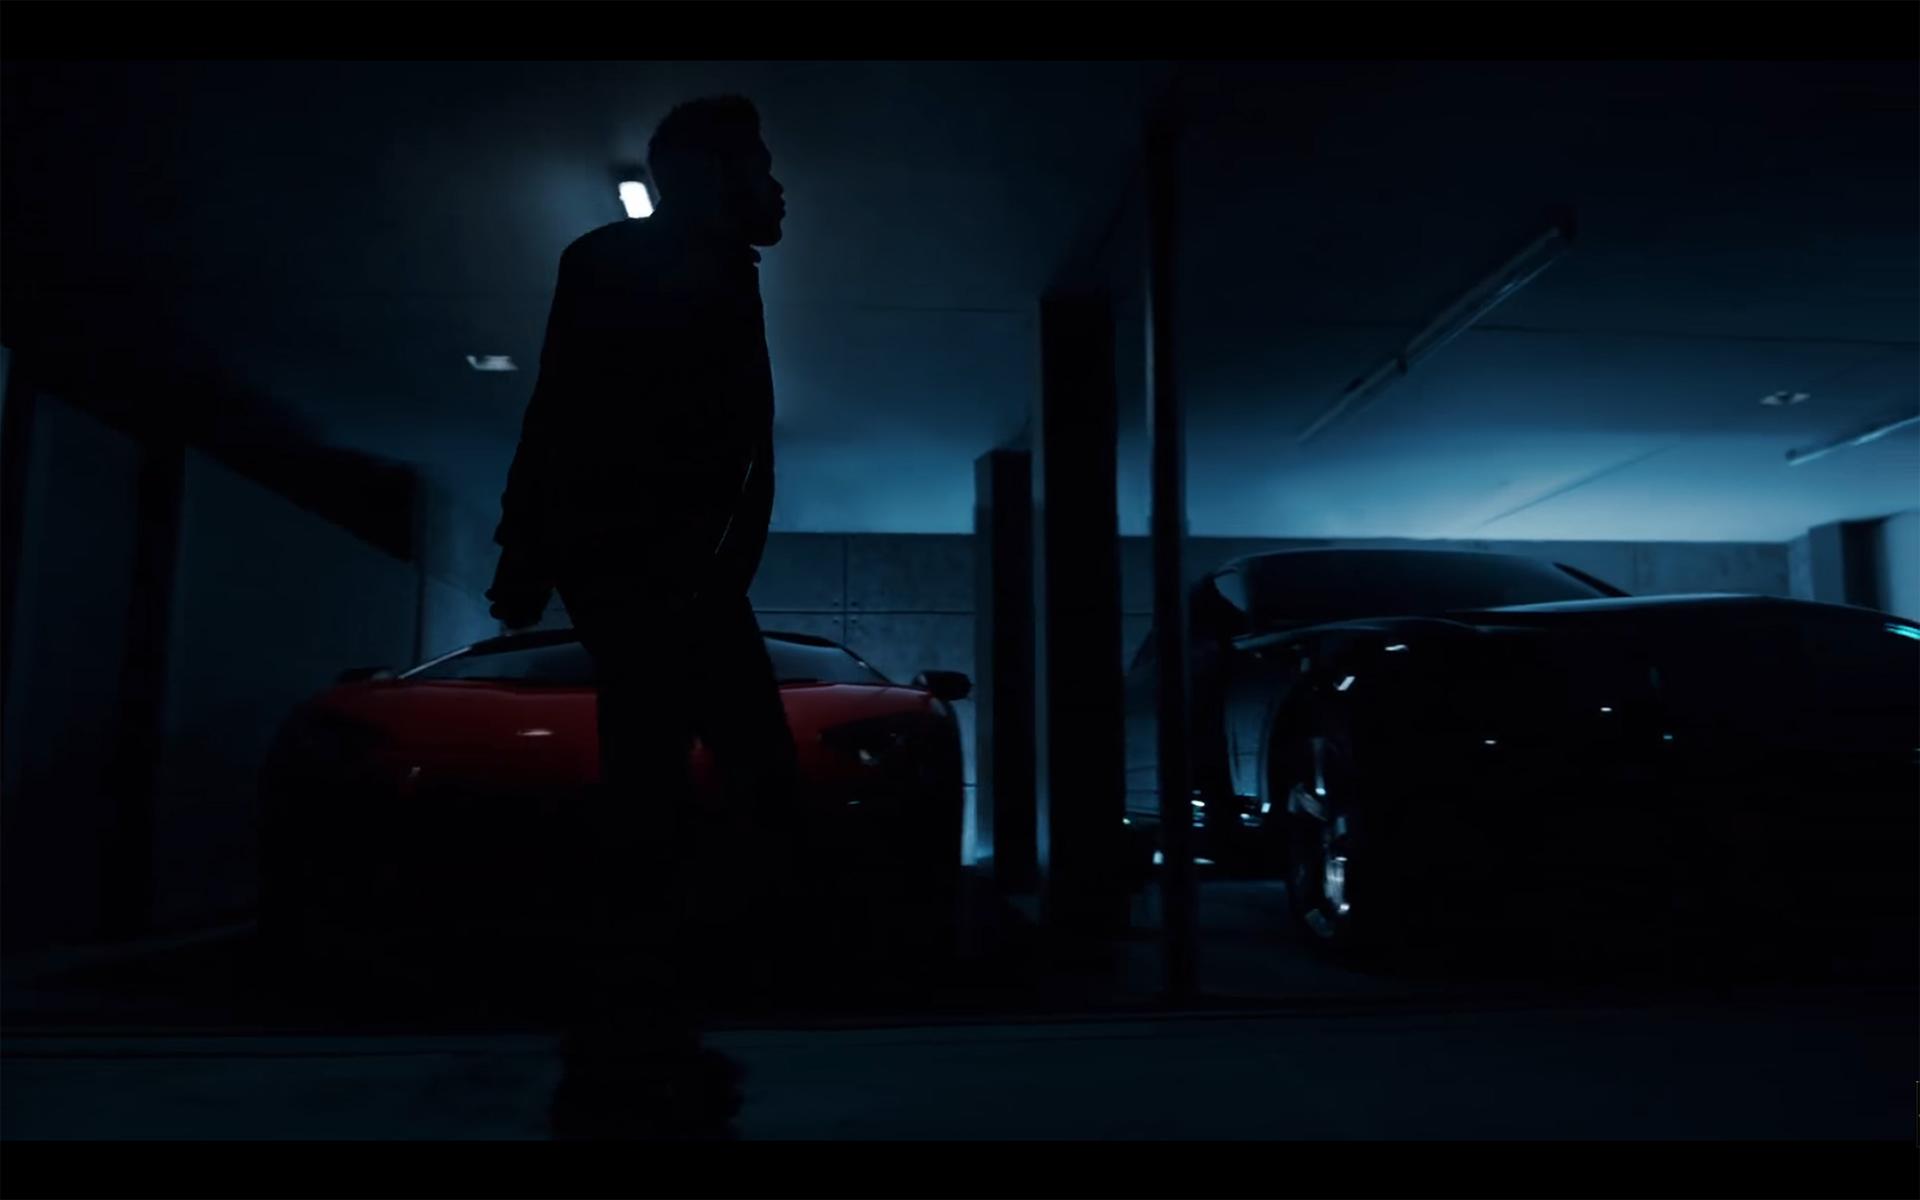 Starboy - The Weeknd - cat - red Lamborghini SV Roadster - walking in garage